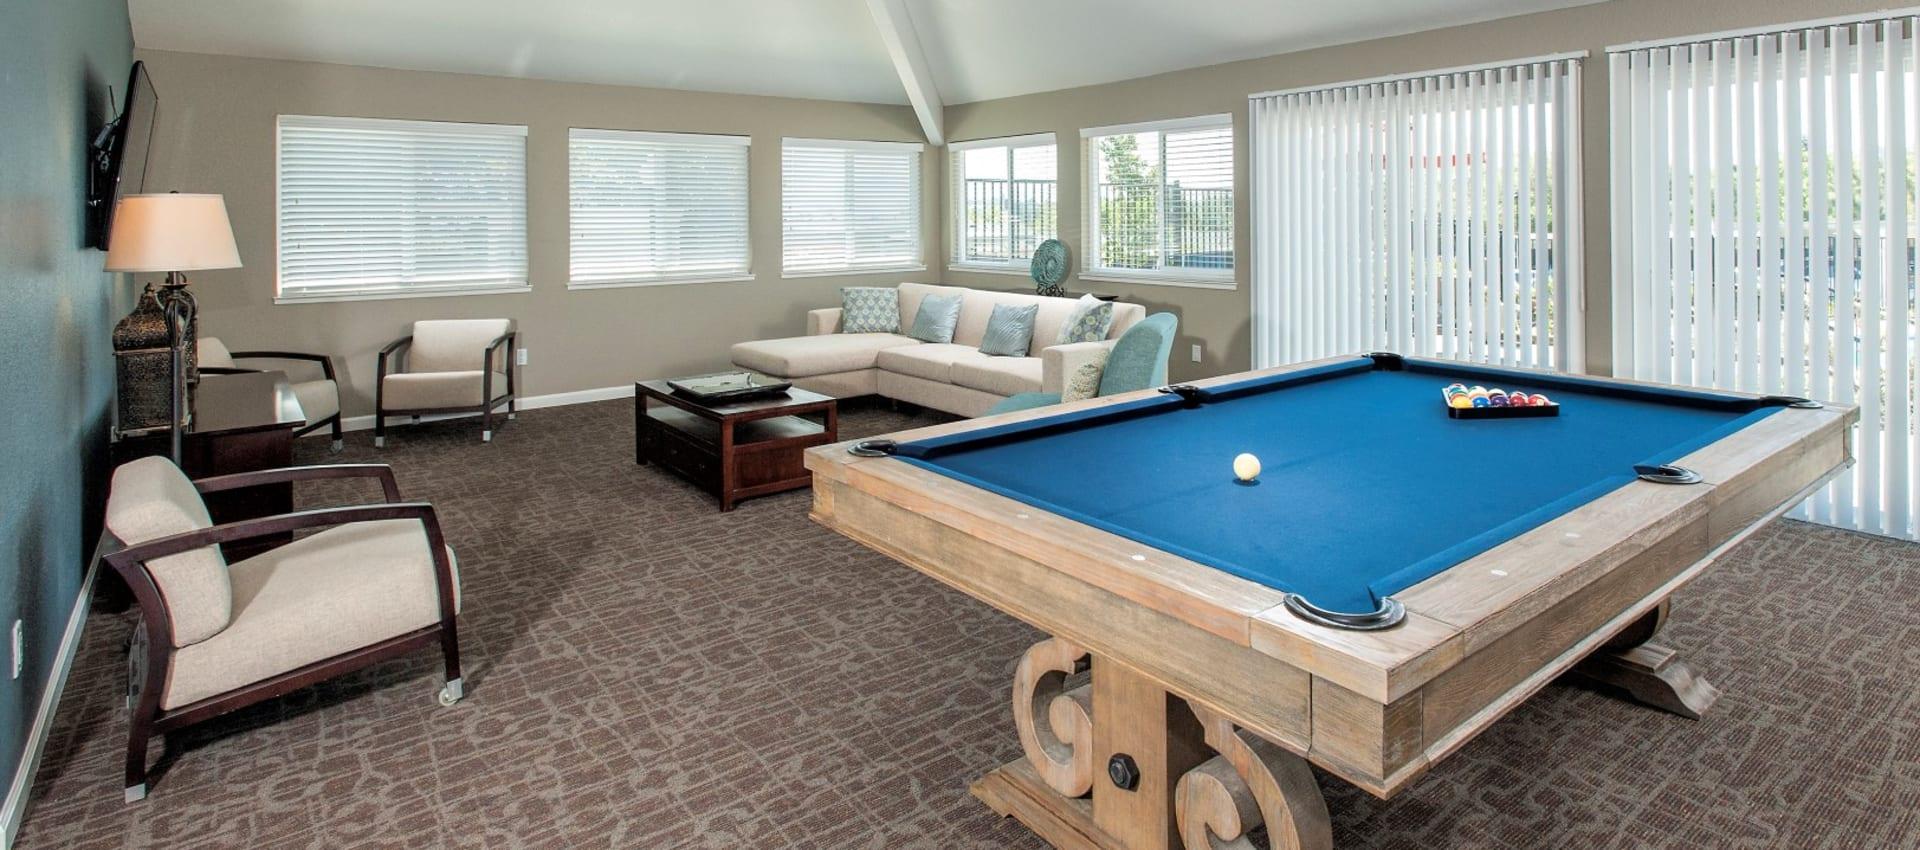 Pool table at Ridgecrest Apartment Homes in Martinez, California